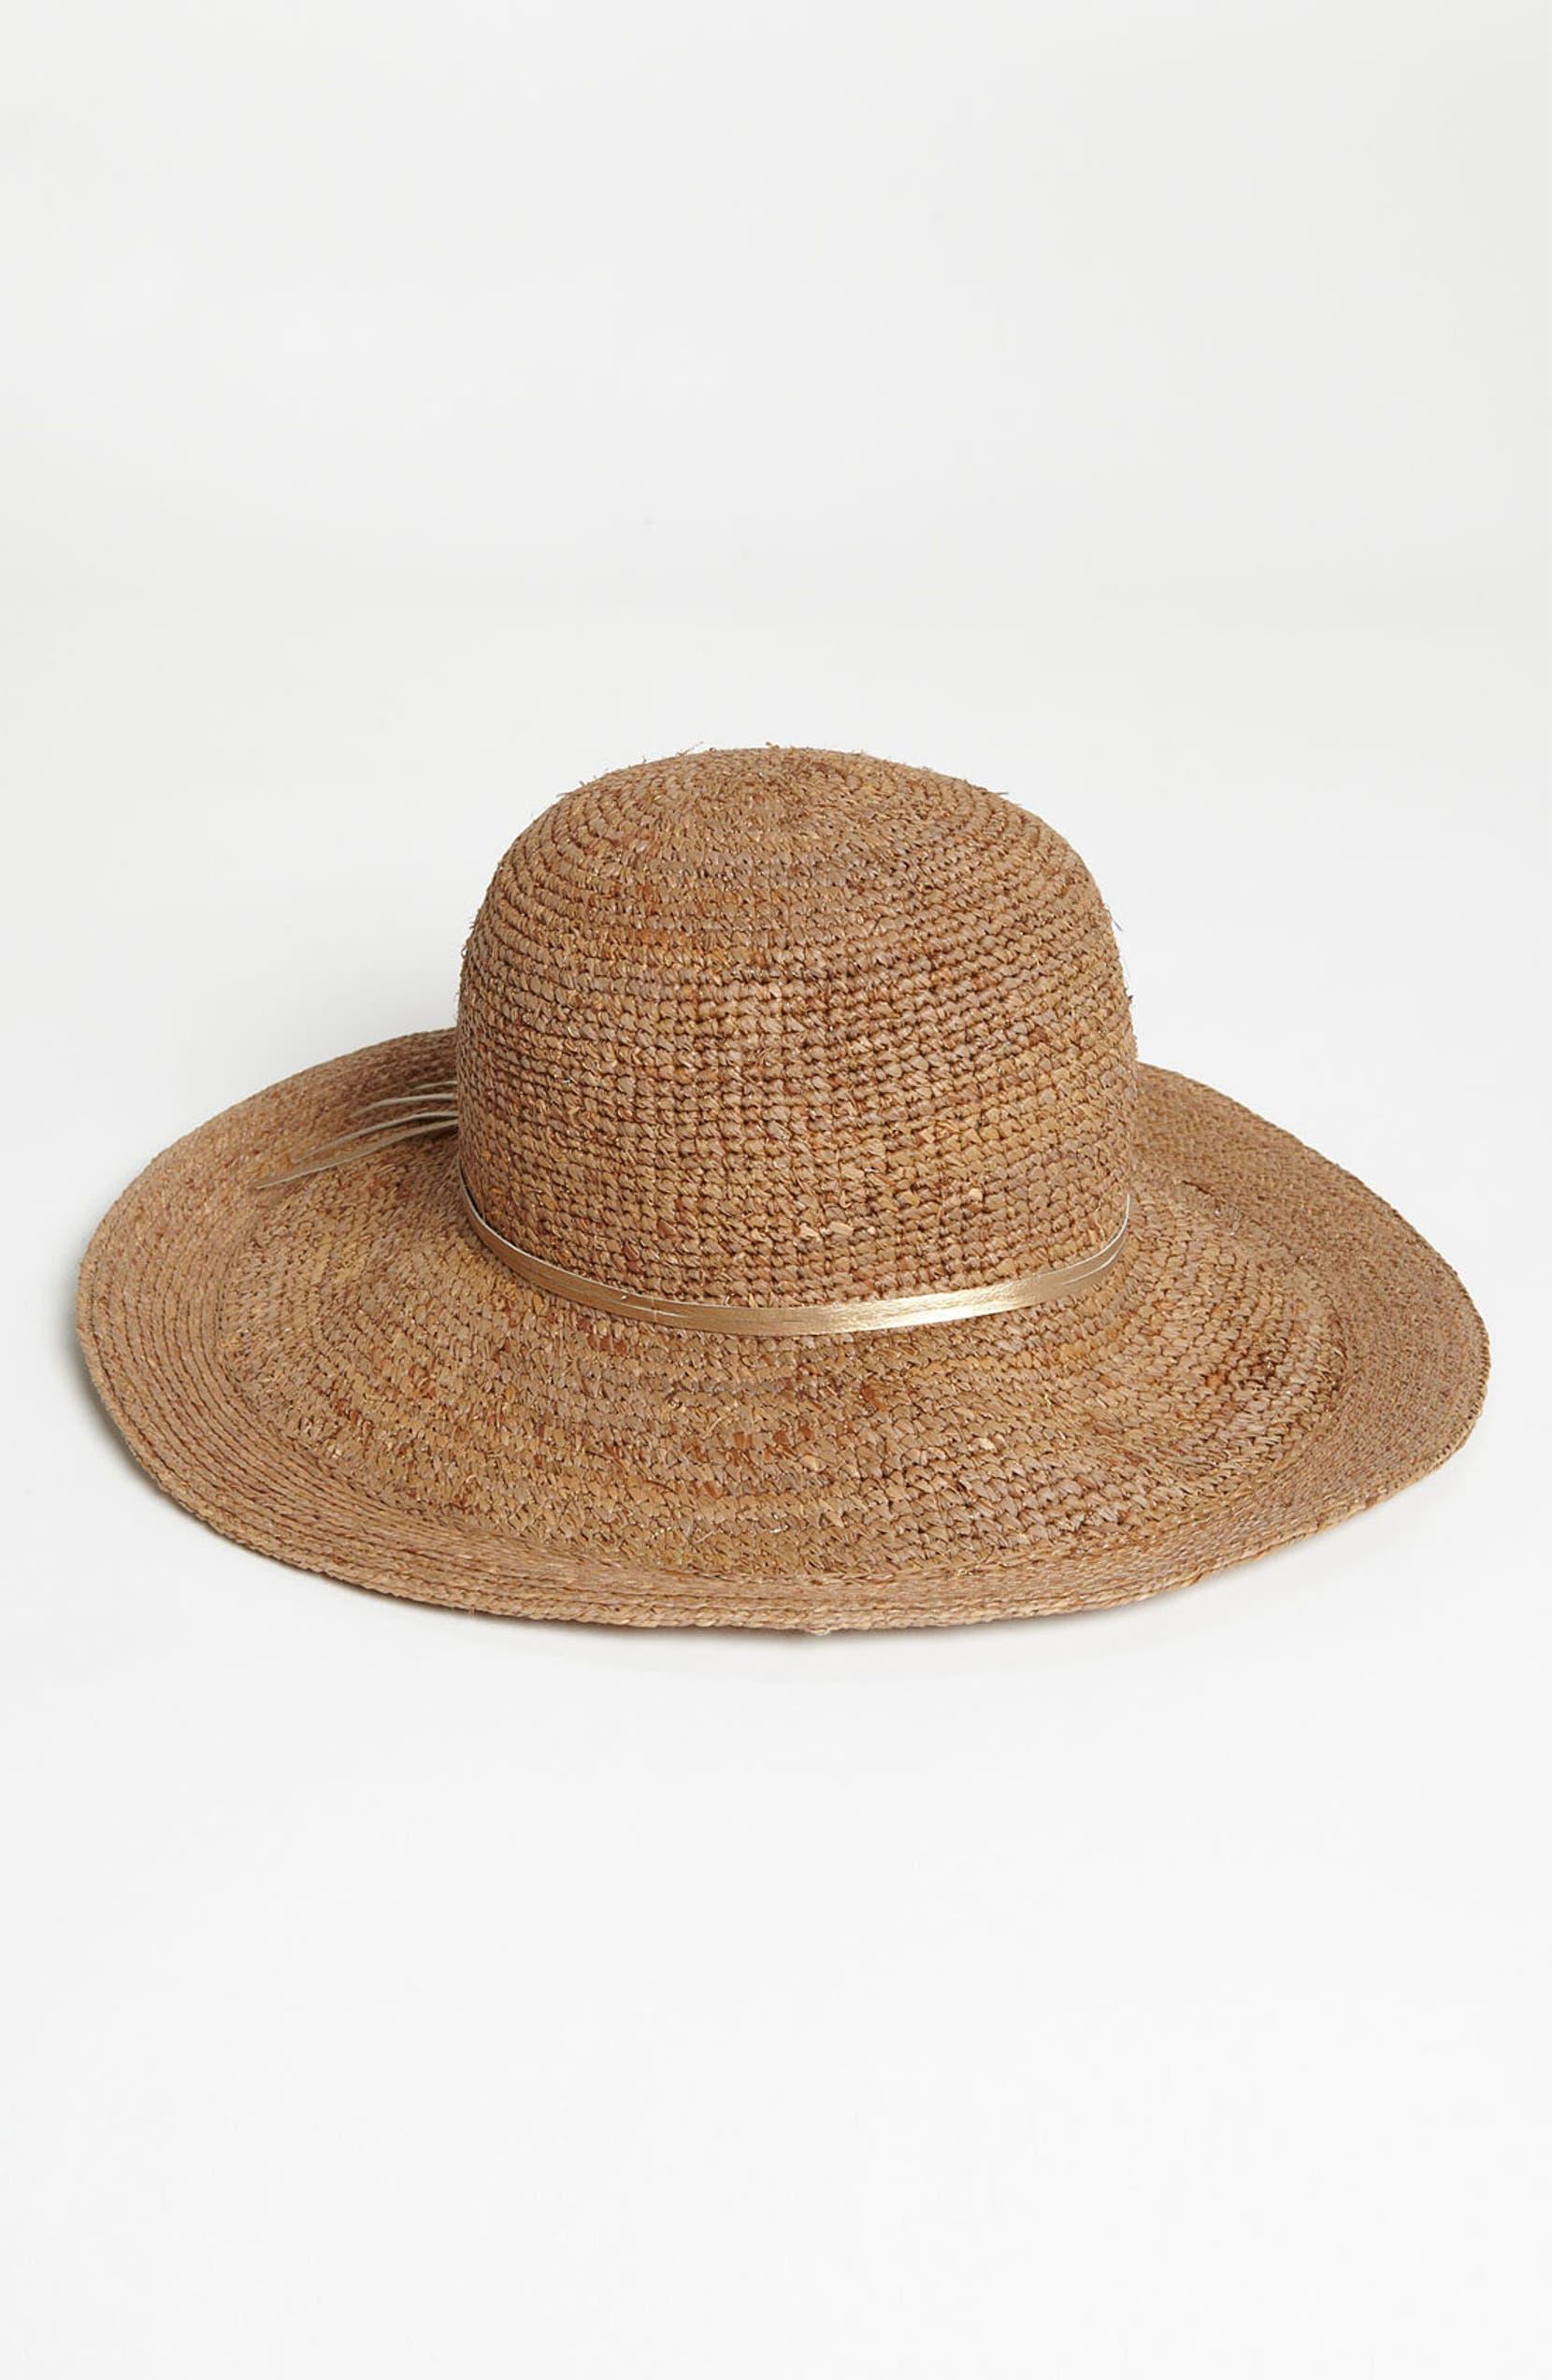 Flora Bella Crochet Raffia Sun Hat  8715fc1d8500